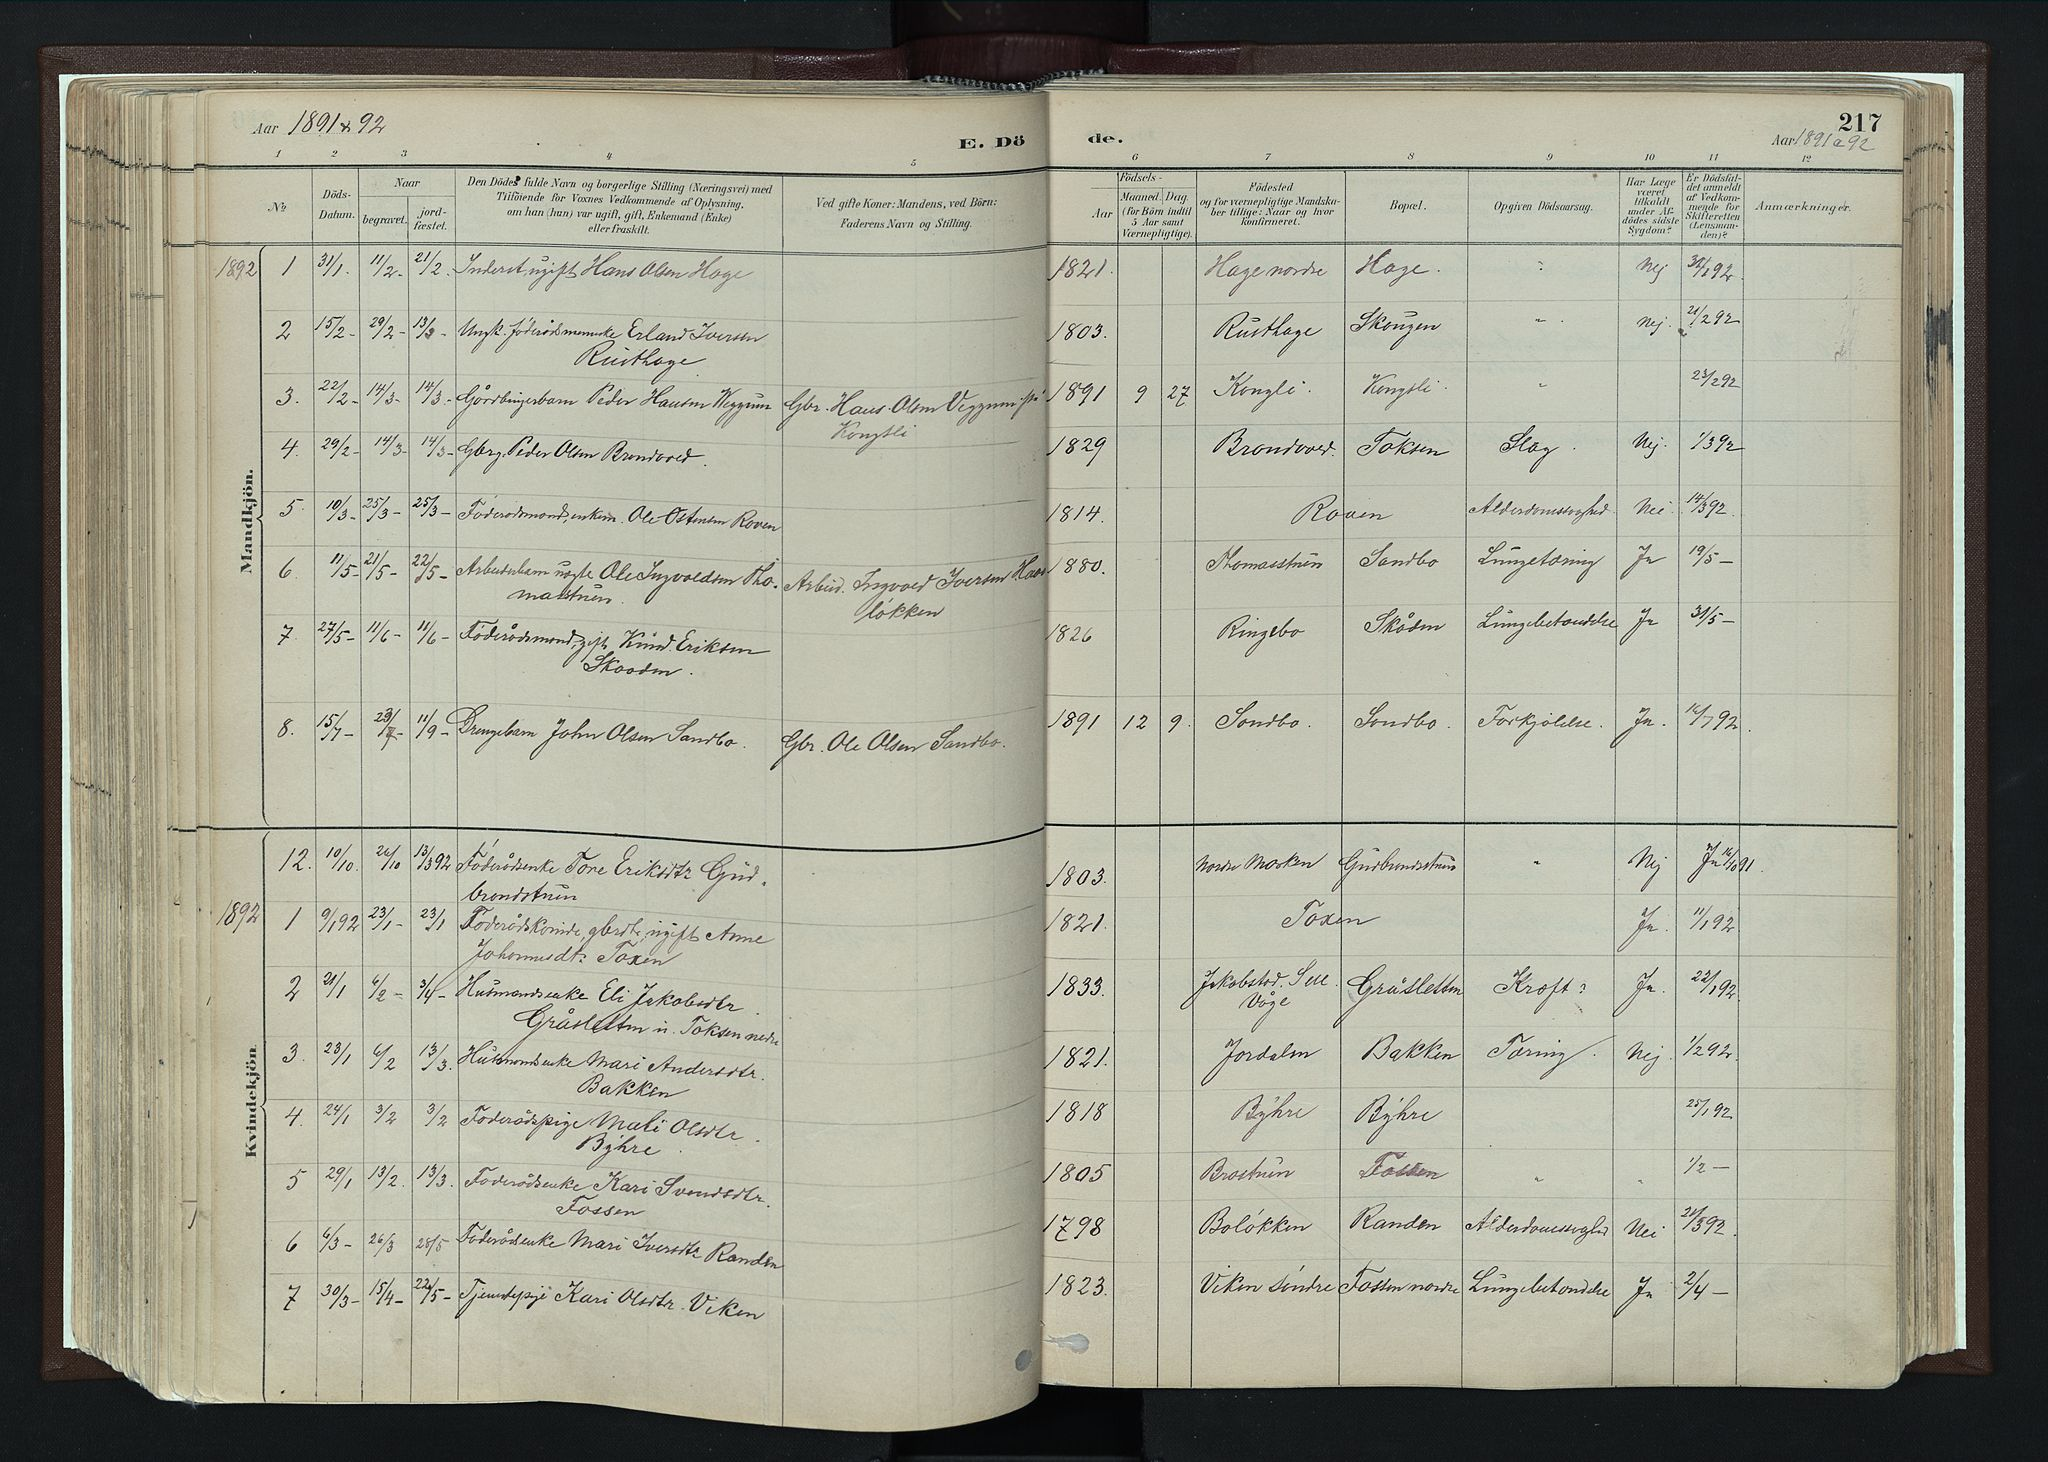 SAH, Nord-Fron prestekontor, Ministerialbok nr. 4, 1884-1914, s. 217